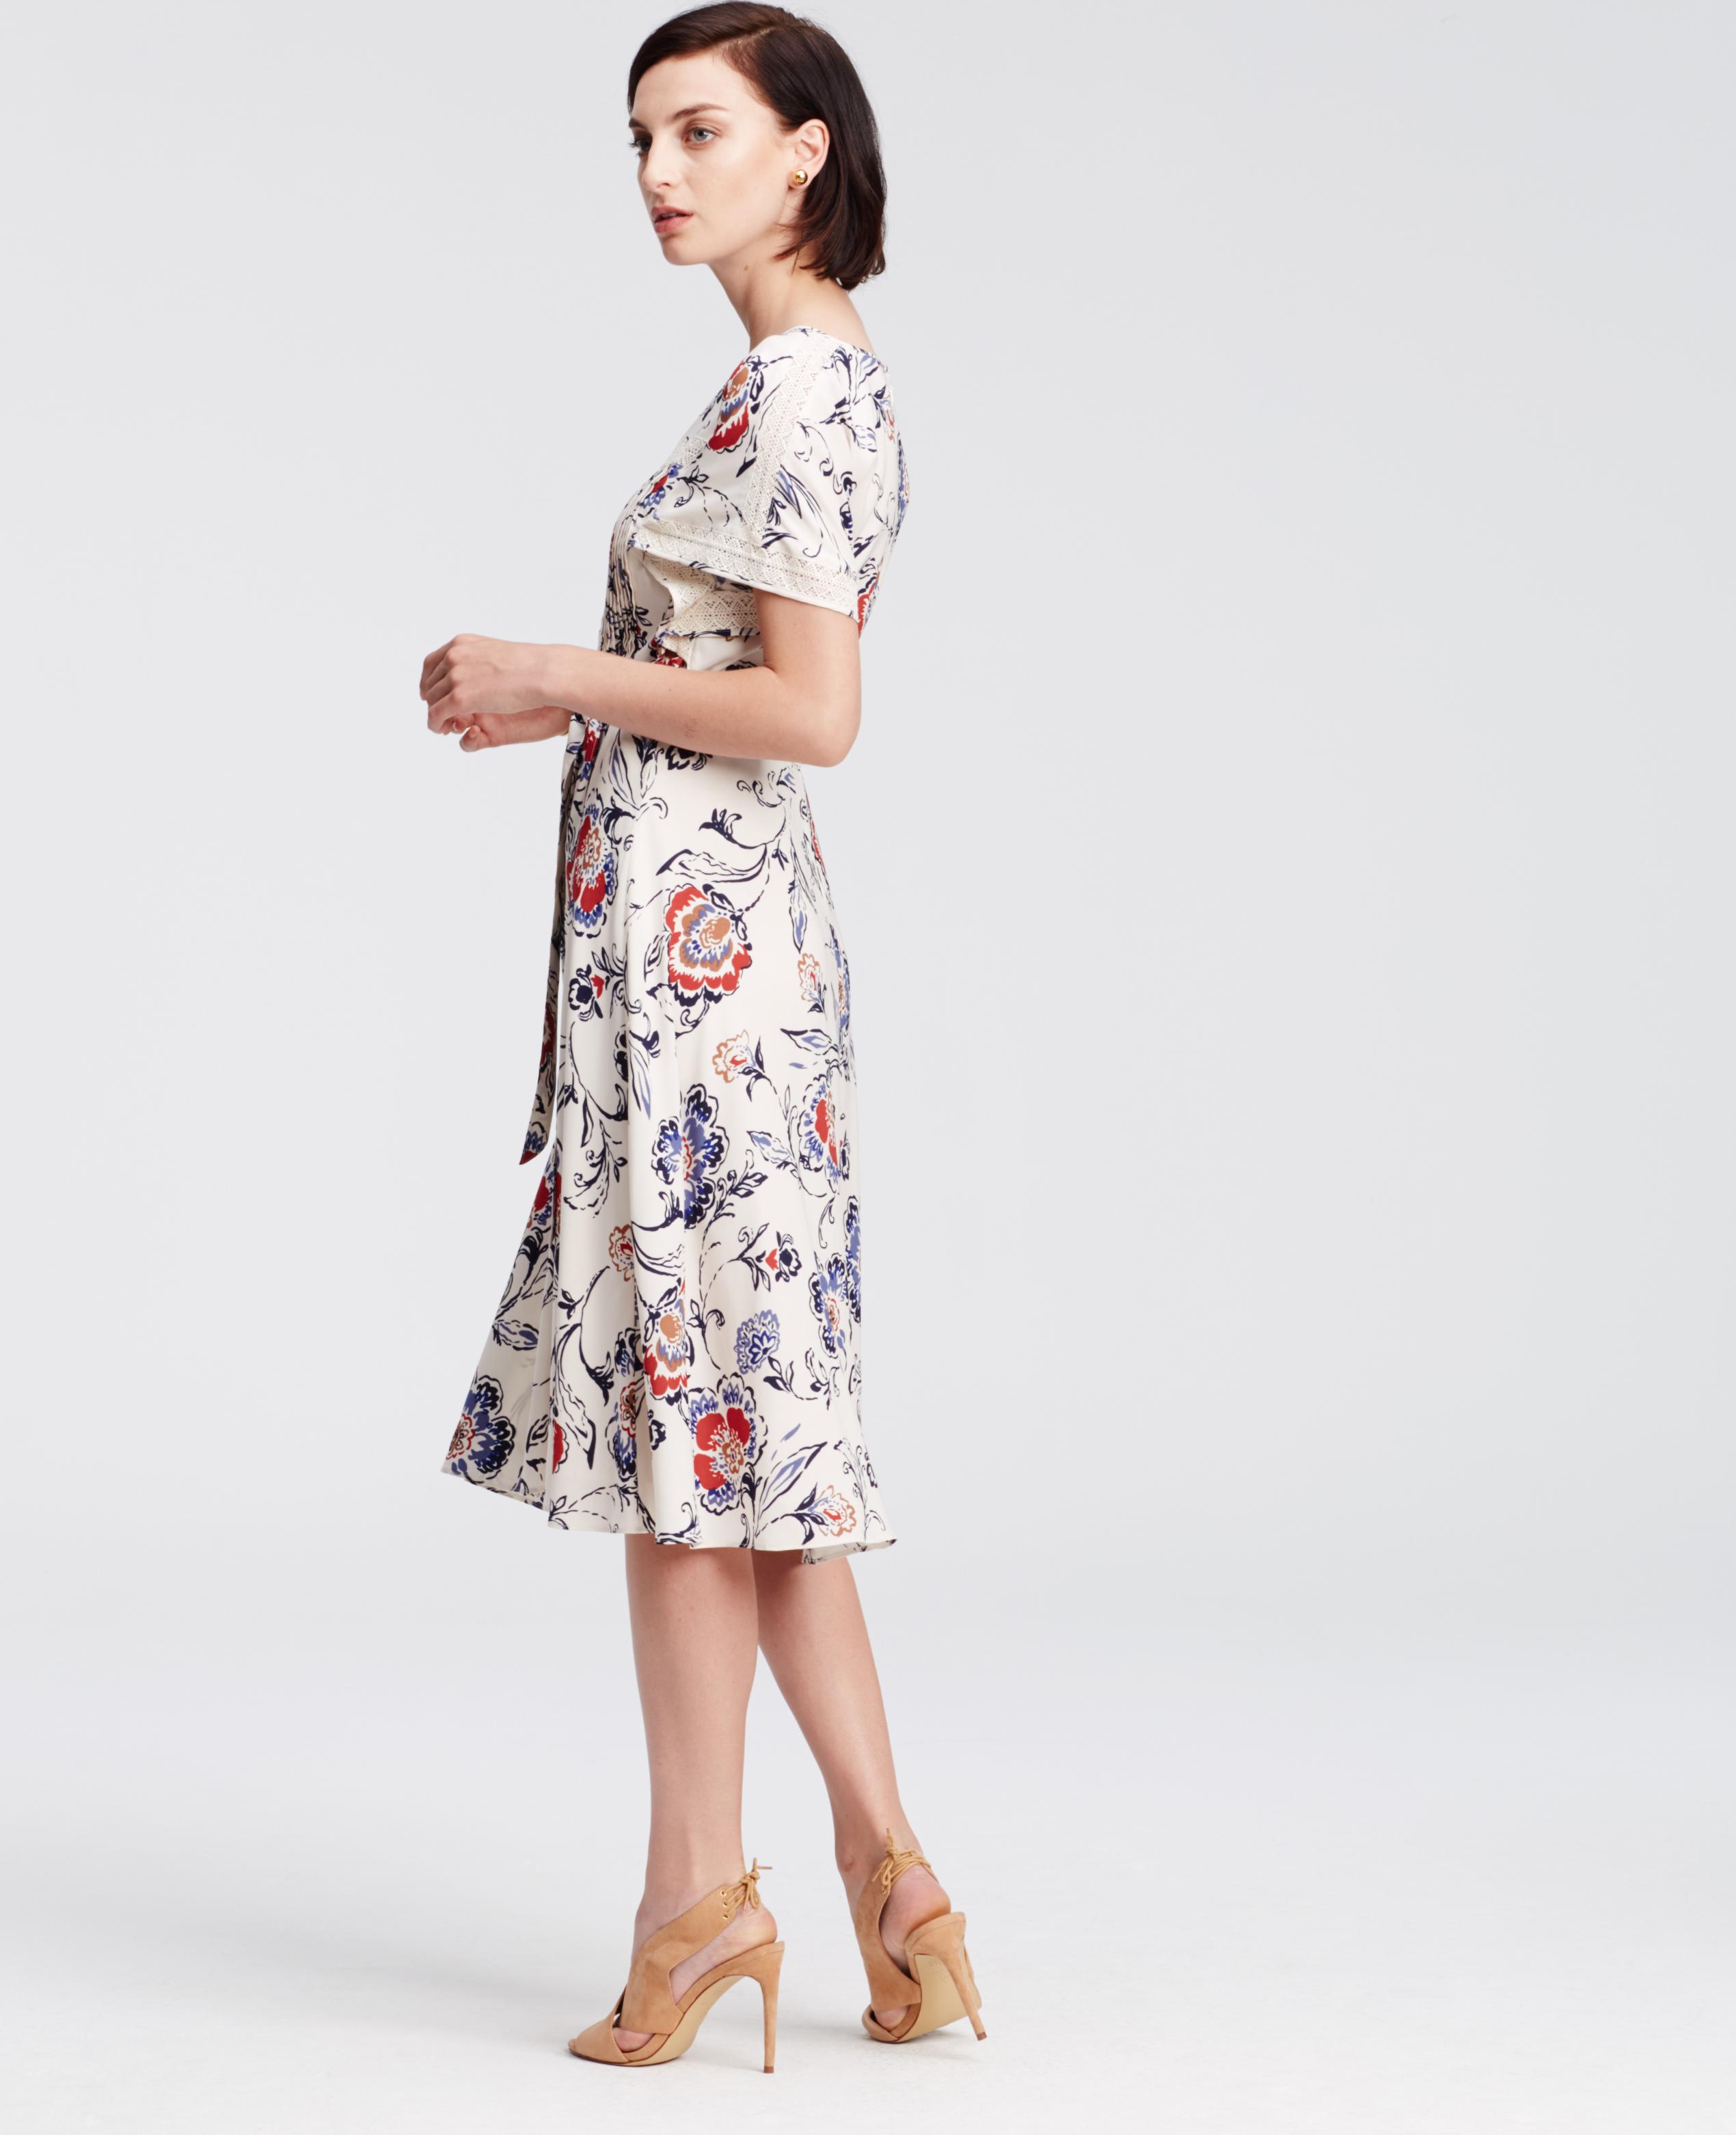 ebc266c5e4 Ann Taylor Floral Lace Trim Midi Dress in Gray - Lyst